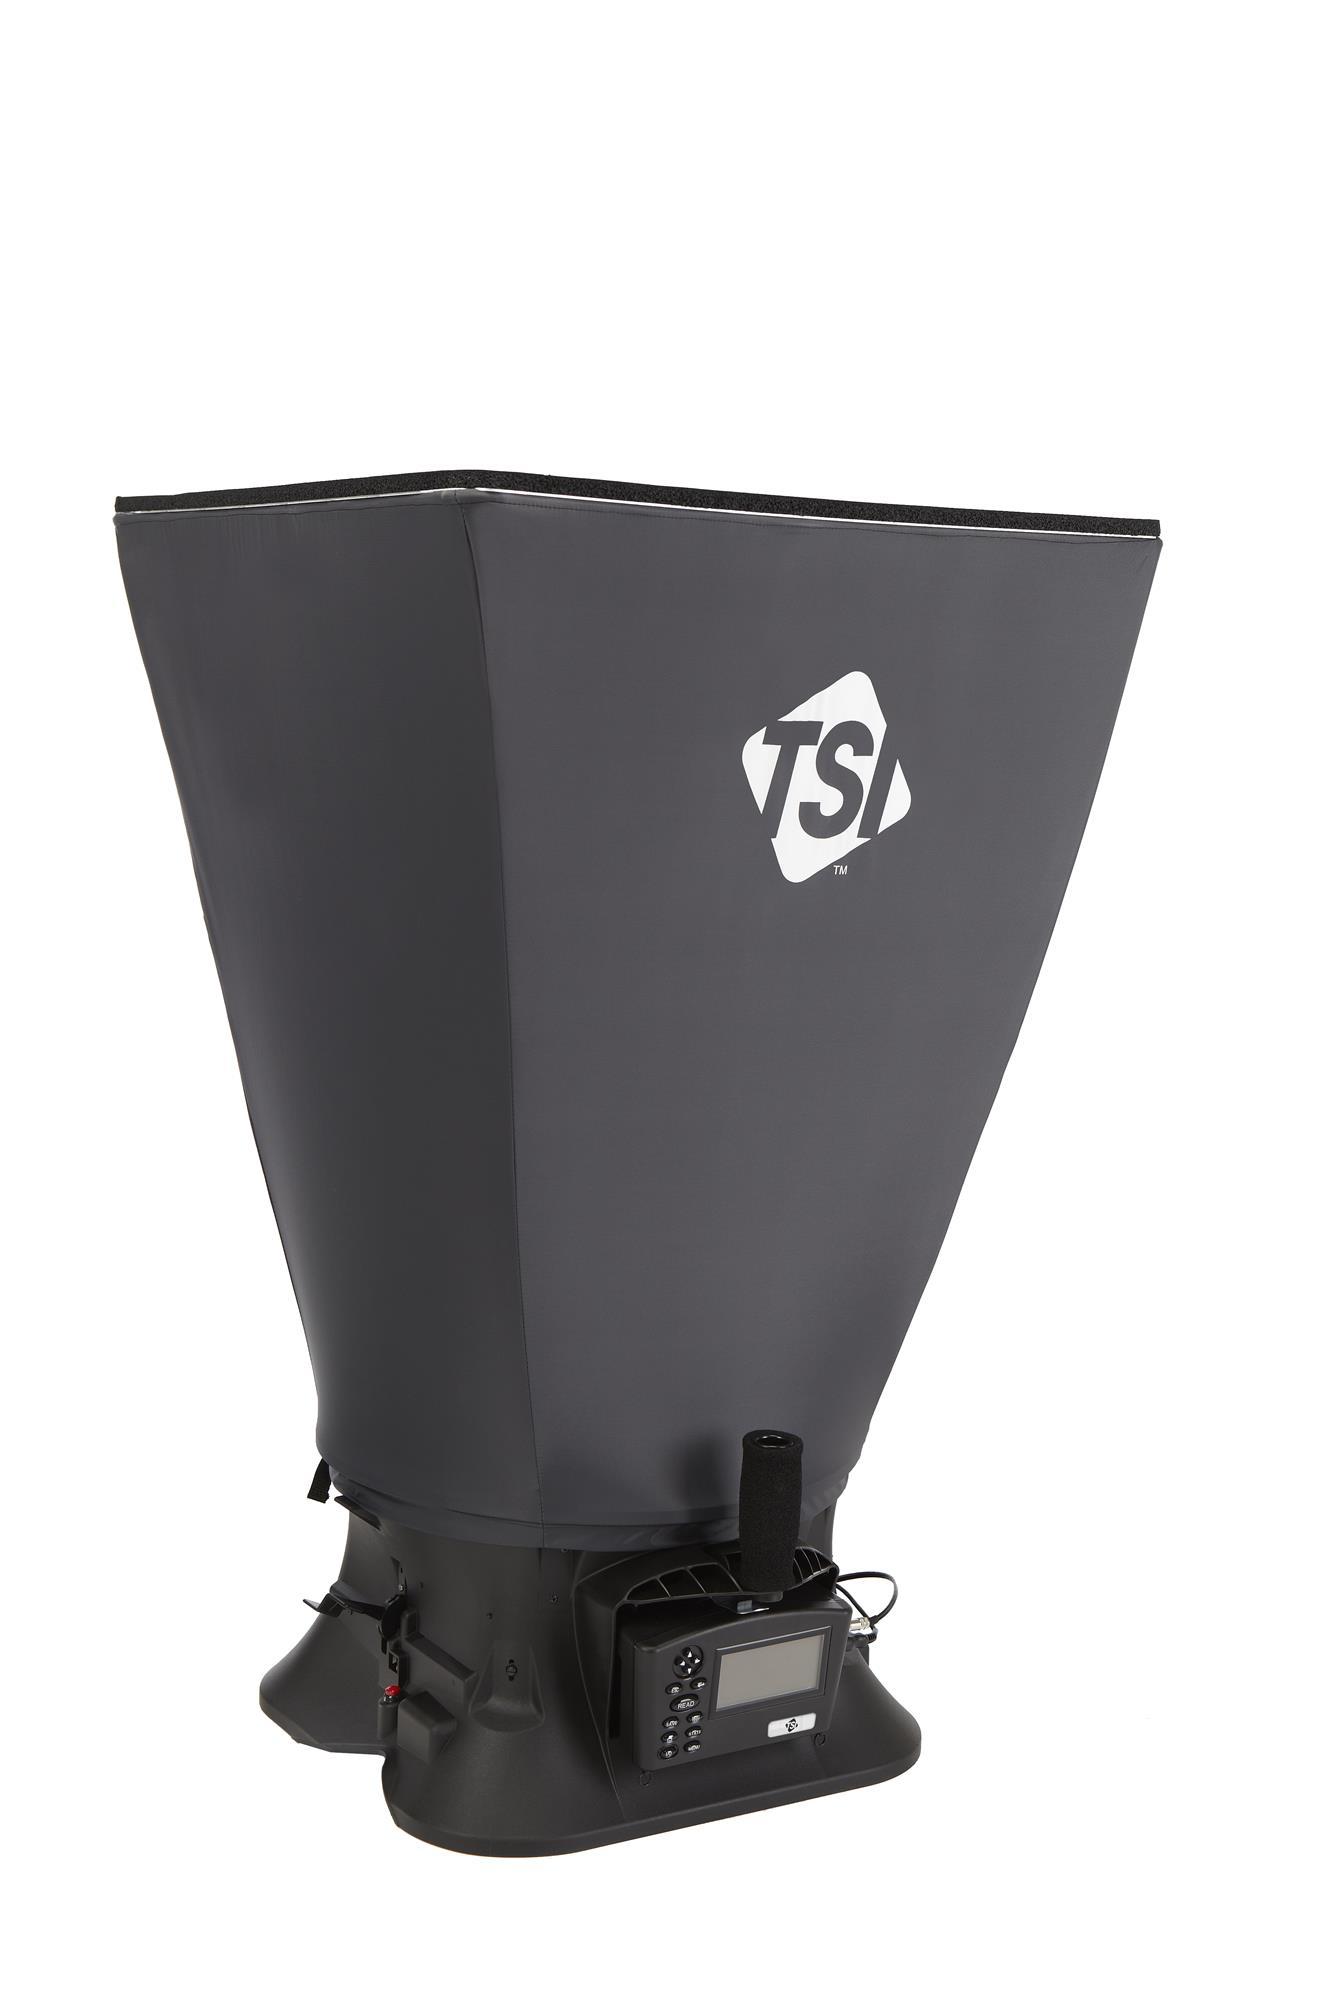 TSI金牌代理商-ACCUBALANCE 8380 数字式风量罩